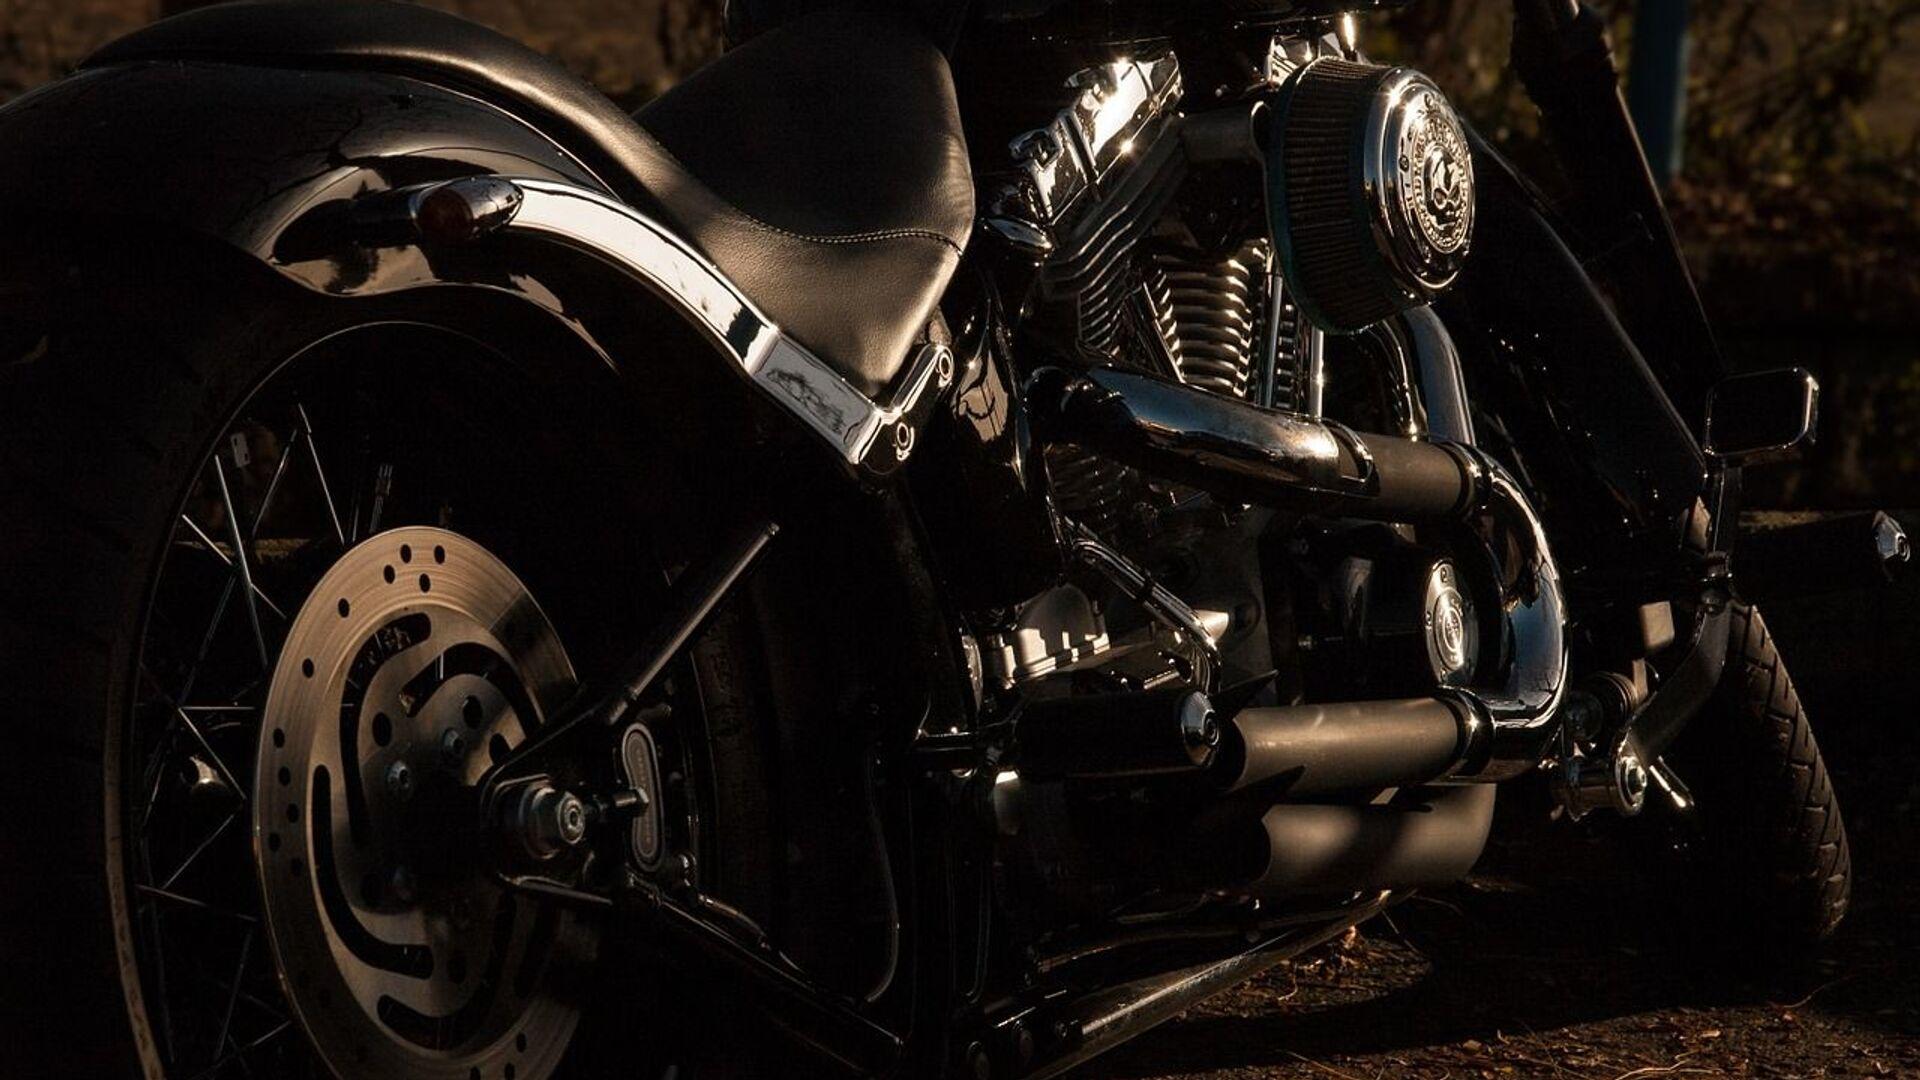 Una motocicleta. Imagen referencial - Sputnik Mundo, 1920, 18.06.2021